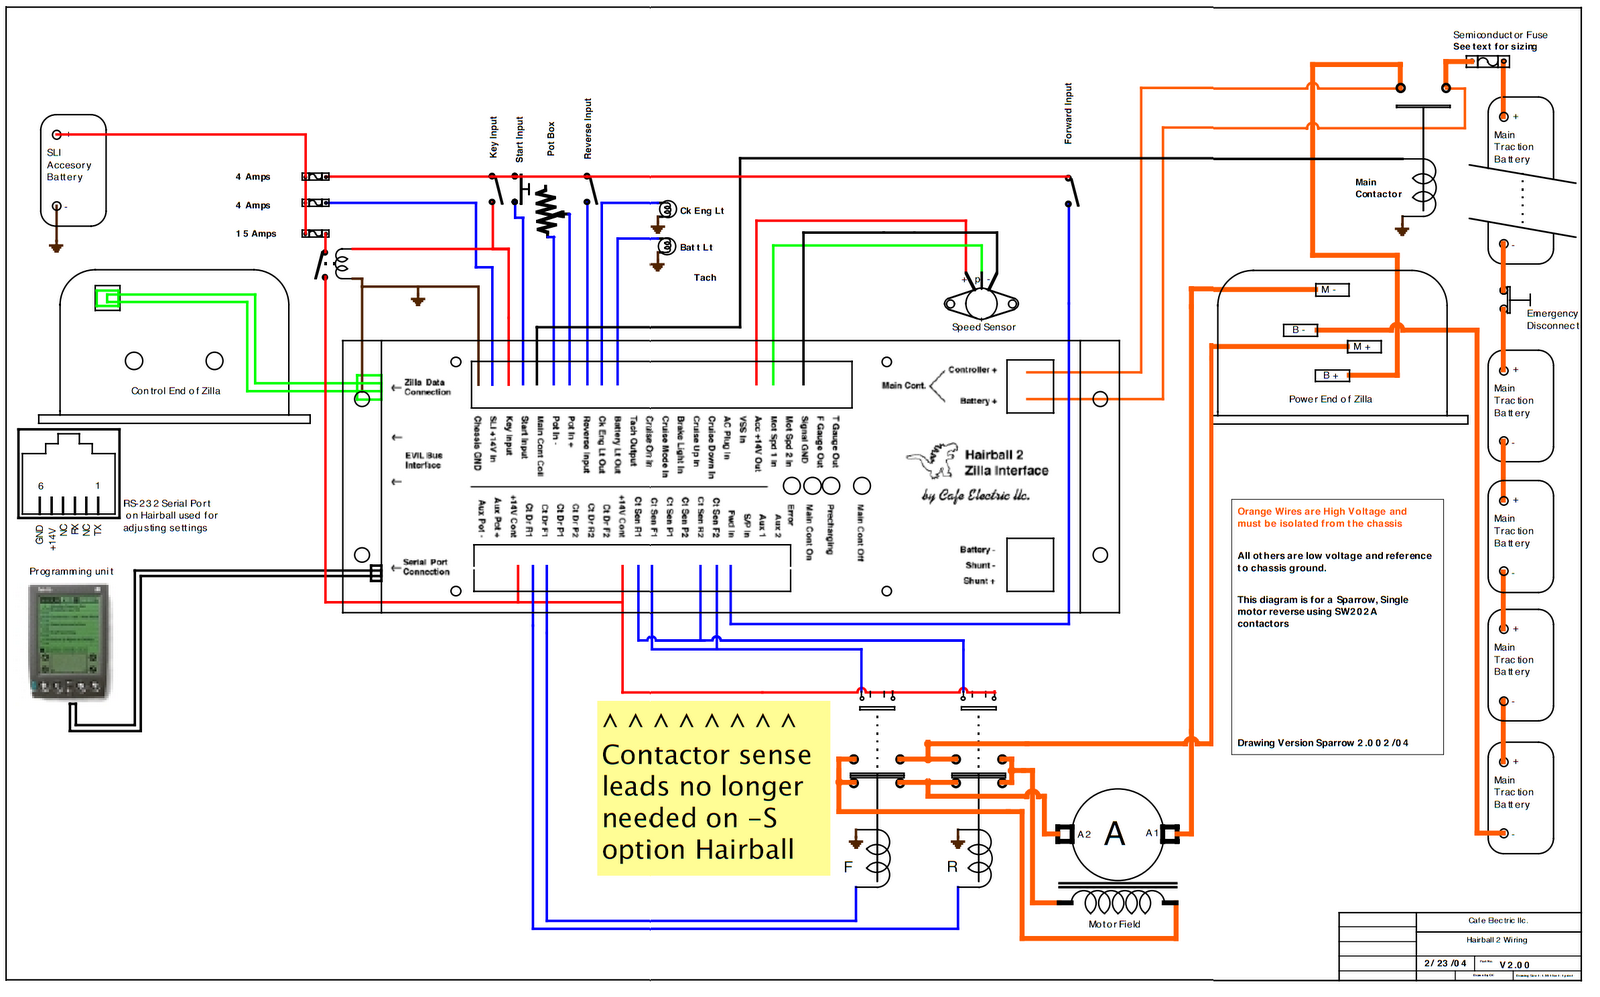 Hn 8748 Wiring Diagram Electrical Also Honda Electrical Wiring Diagrams